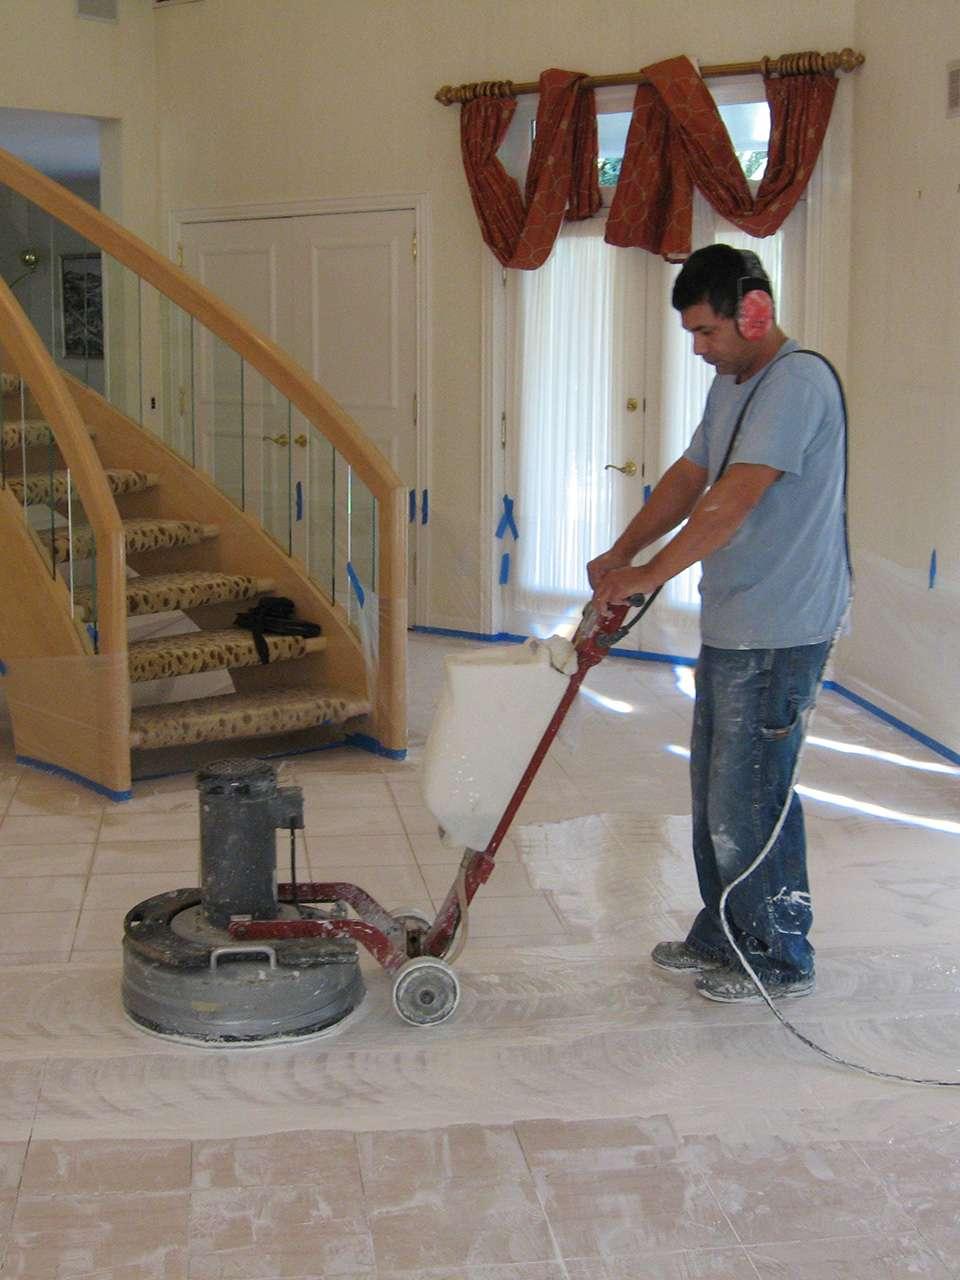 Marble Floor Cleaning Polishing Sealing Weybridge Surrey: Marble Floor Polishing Cleaning